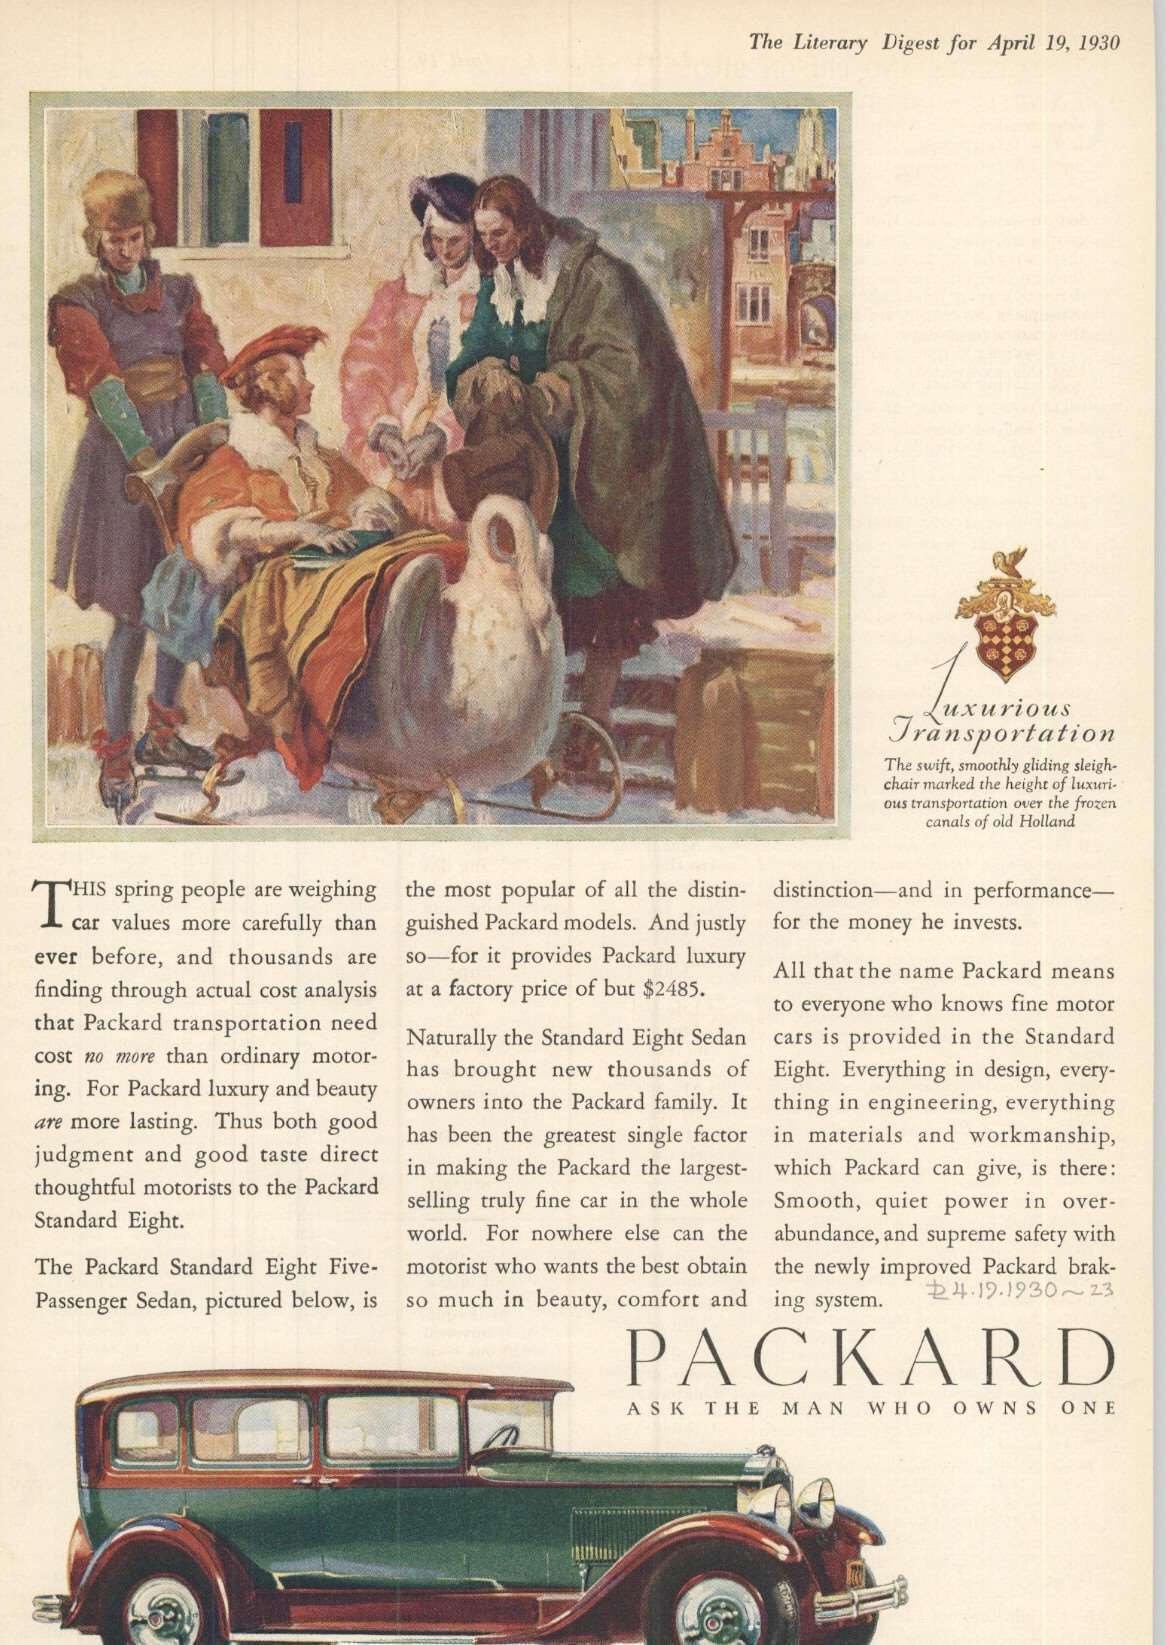 1930 Standard Eight Five Passenger Sedan - Advertisement